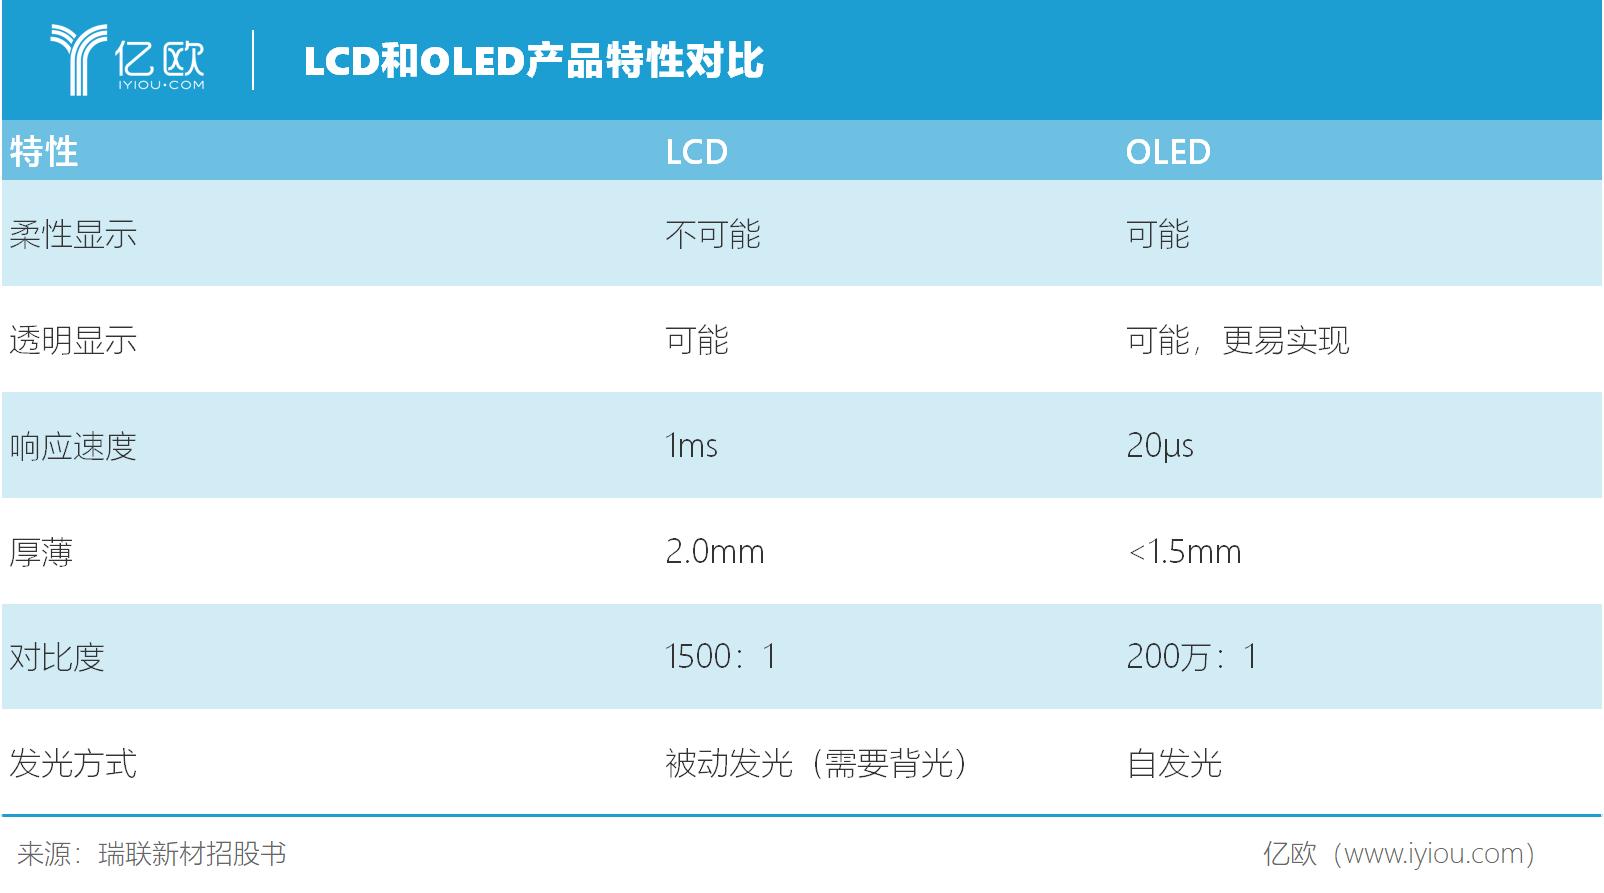 OLED大势已成,液晶材料起家的瑞联新材能否抢占先机?